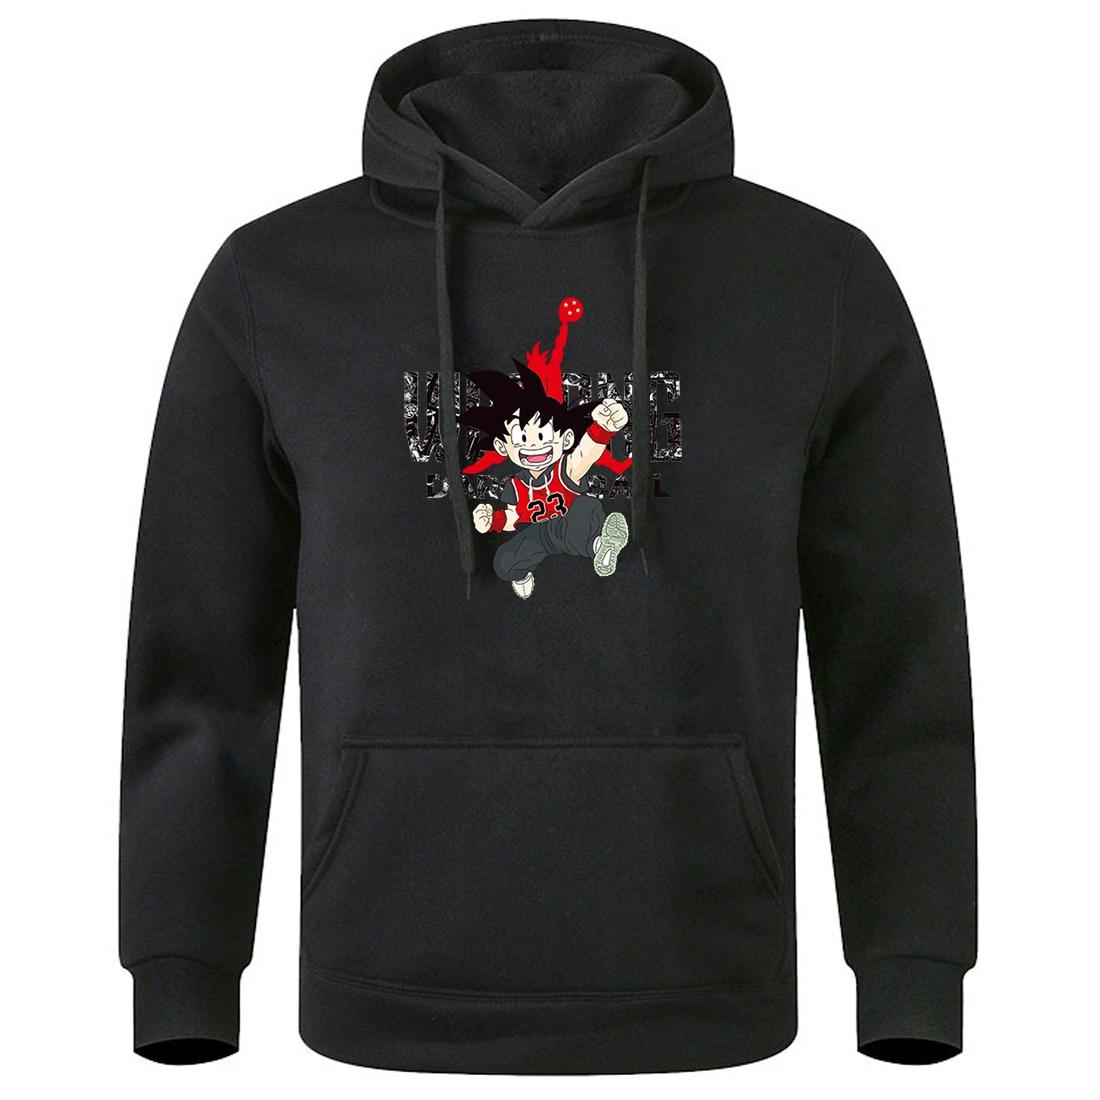 Mens Hooded Tops Dragon Ball Anime Hoodies 2020 Keep Warm Winter Spring Sweatshirt Male Round Neck Hoody Streetwear Tracksuits